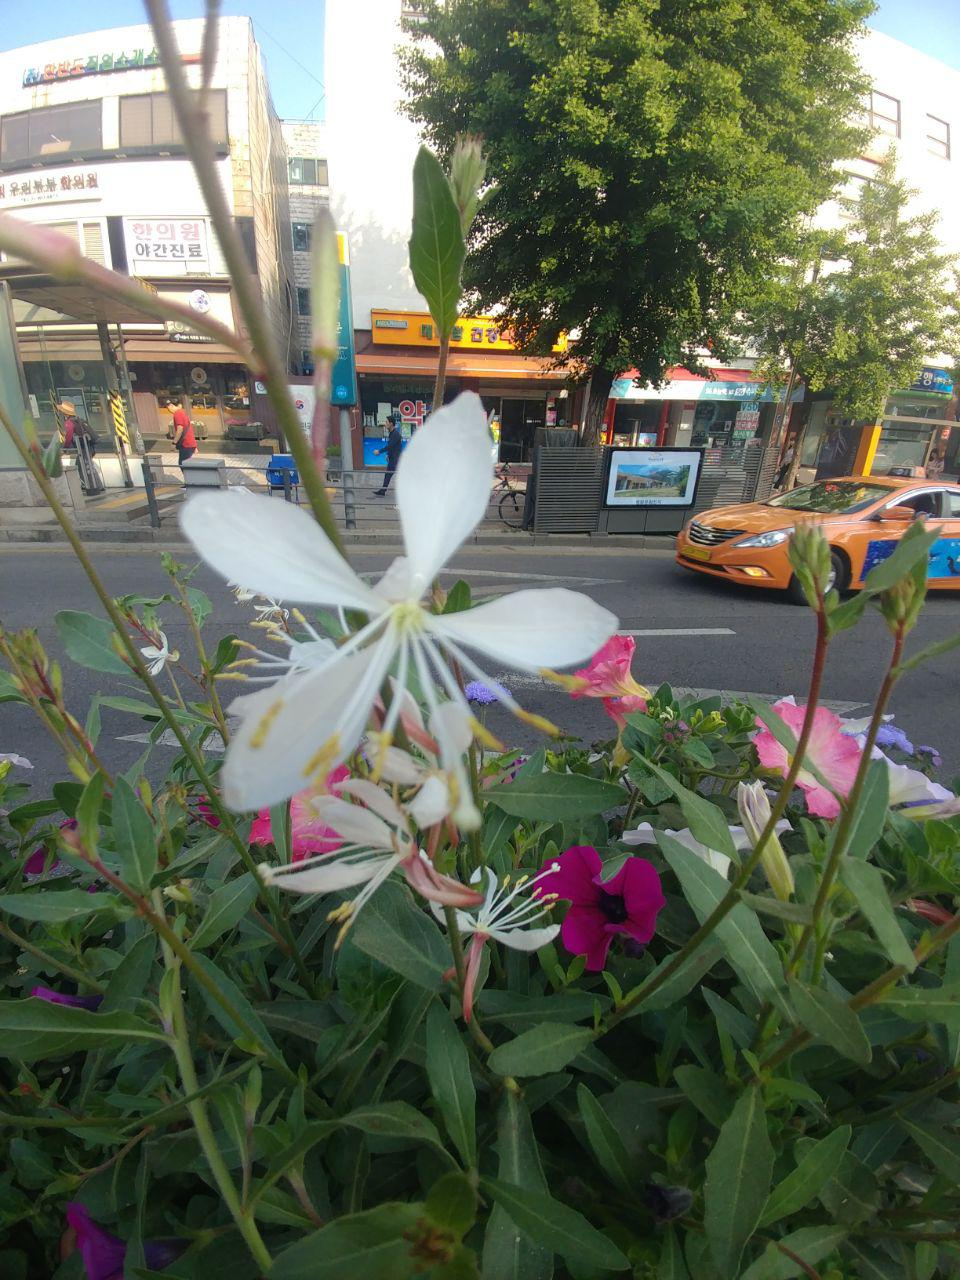 photo_2019-05-19_21-14-32.jpg